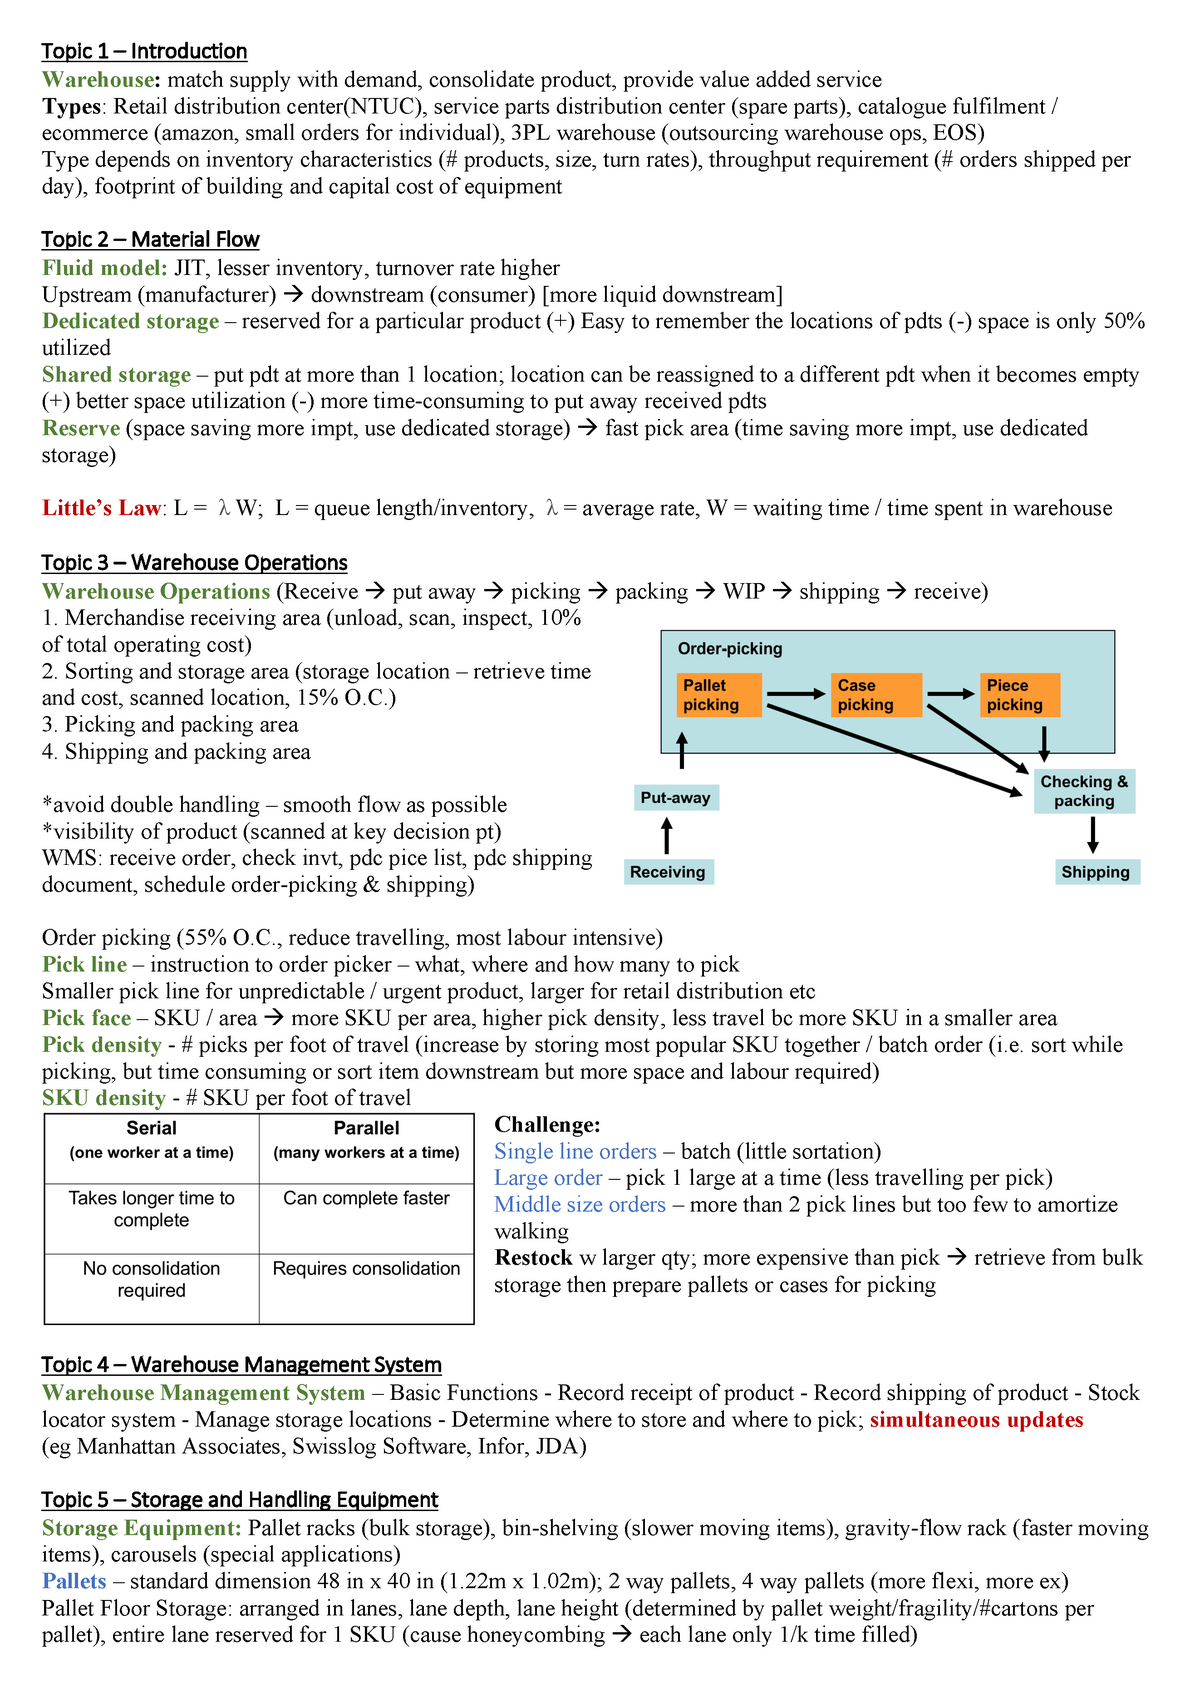 Descargar Pdf Ebook Warehousing Cheatsheet - OPIM322 - StuDocu